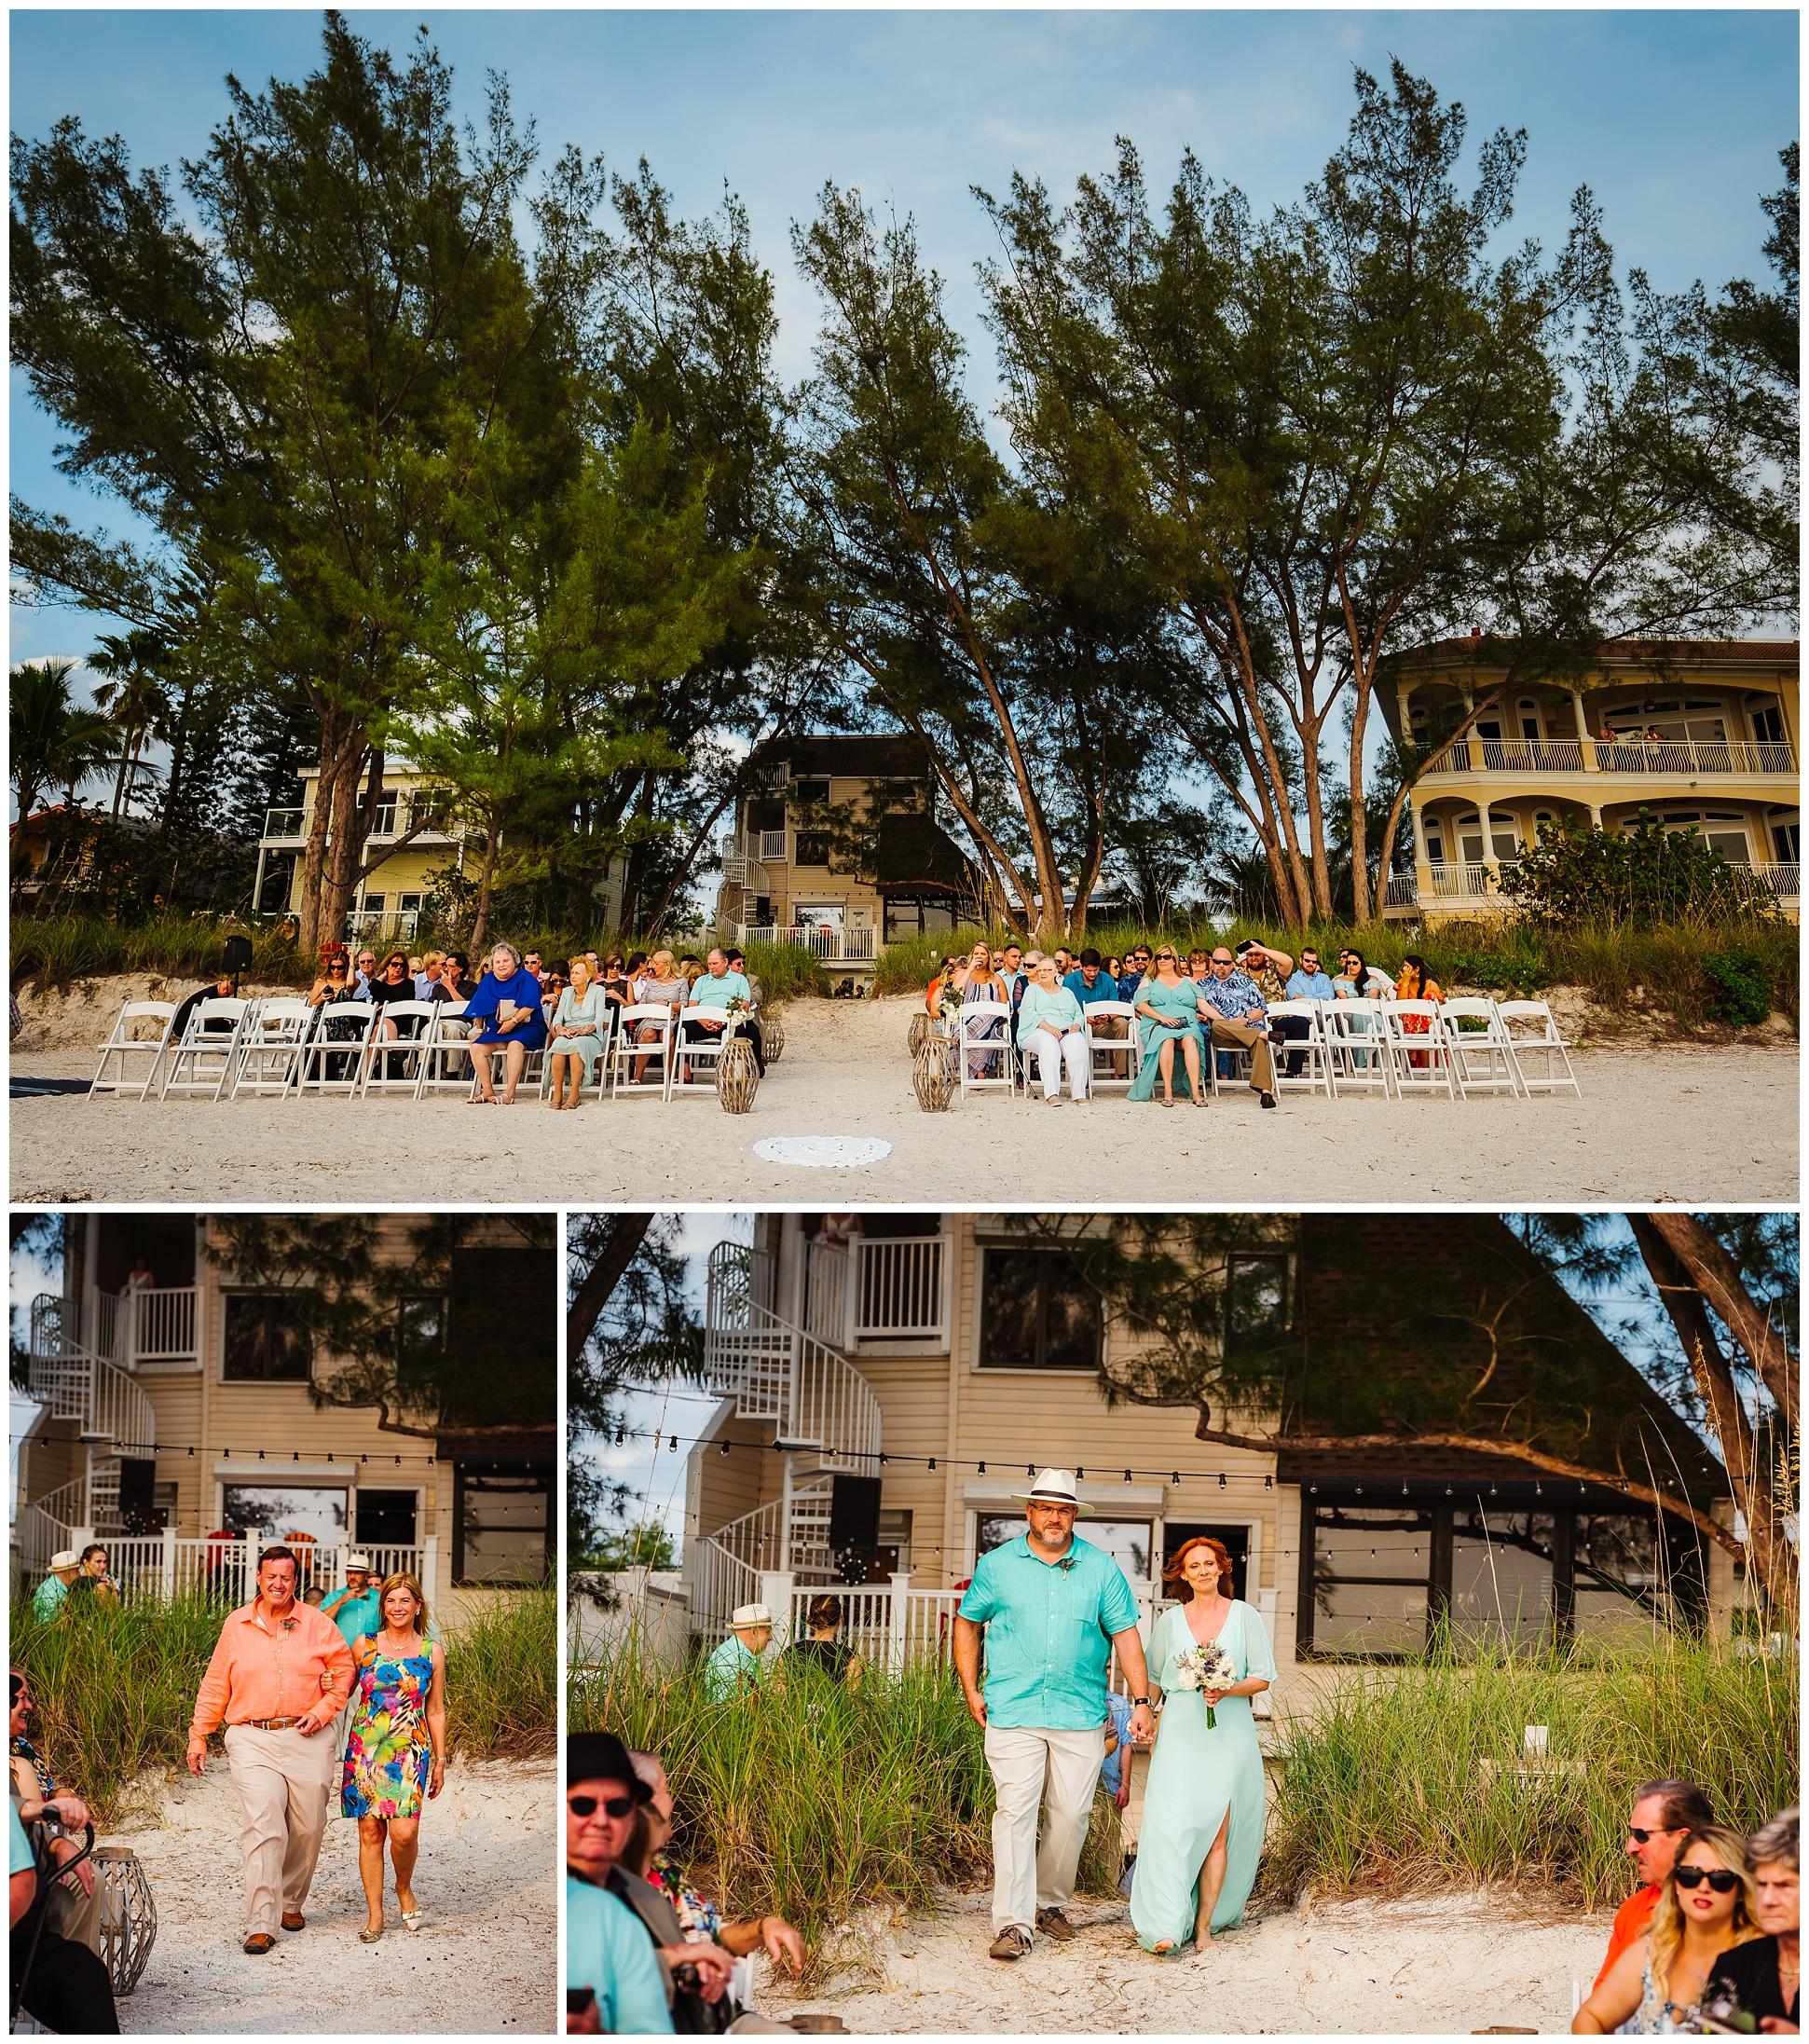 tampa-st-pete-wedding-photographer-indian-rocks-beach-mermaid-train-redhead_0128.jpg